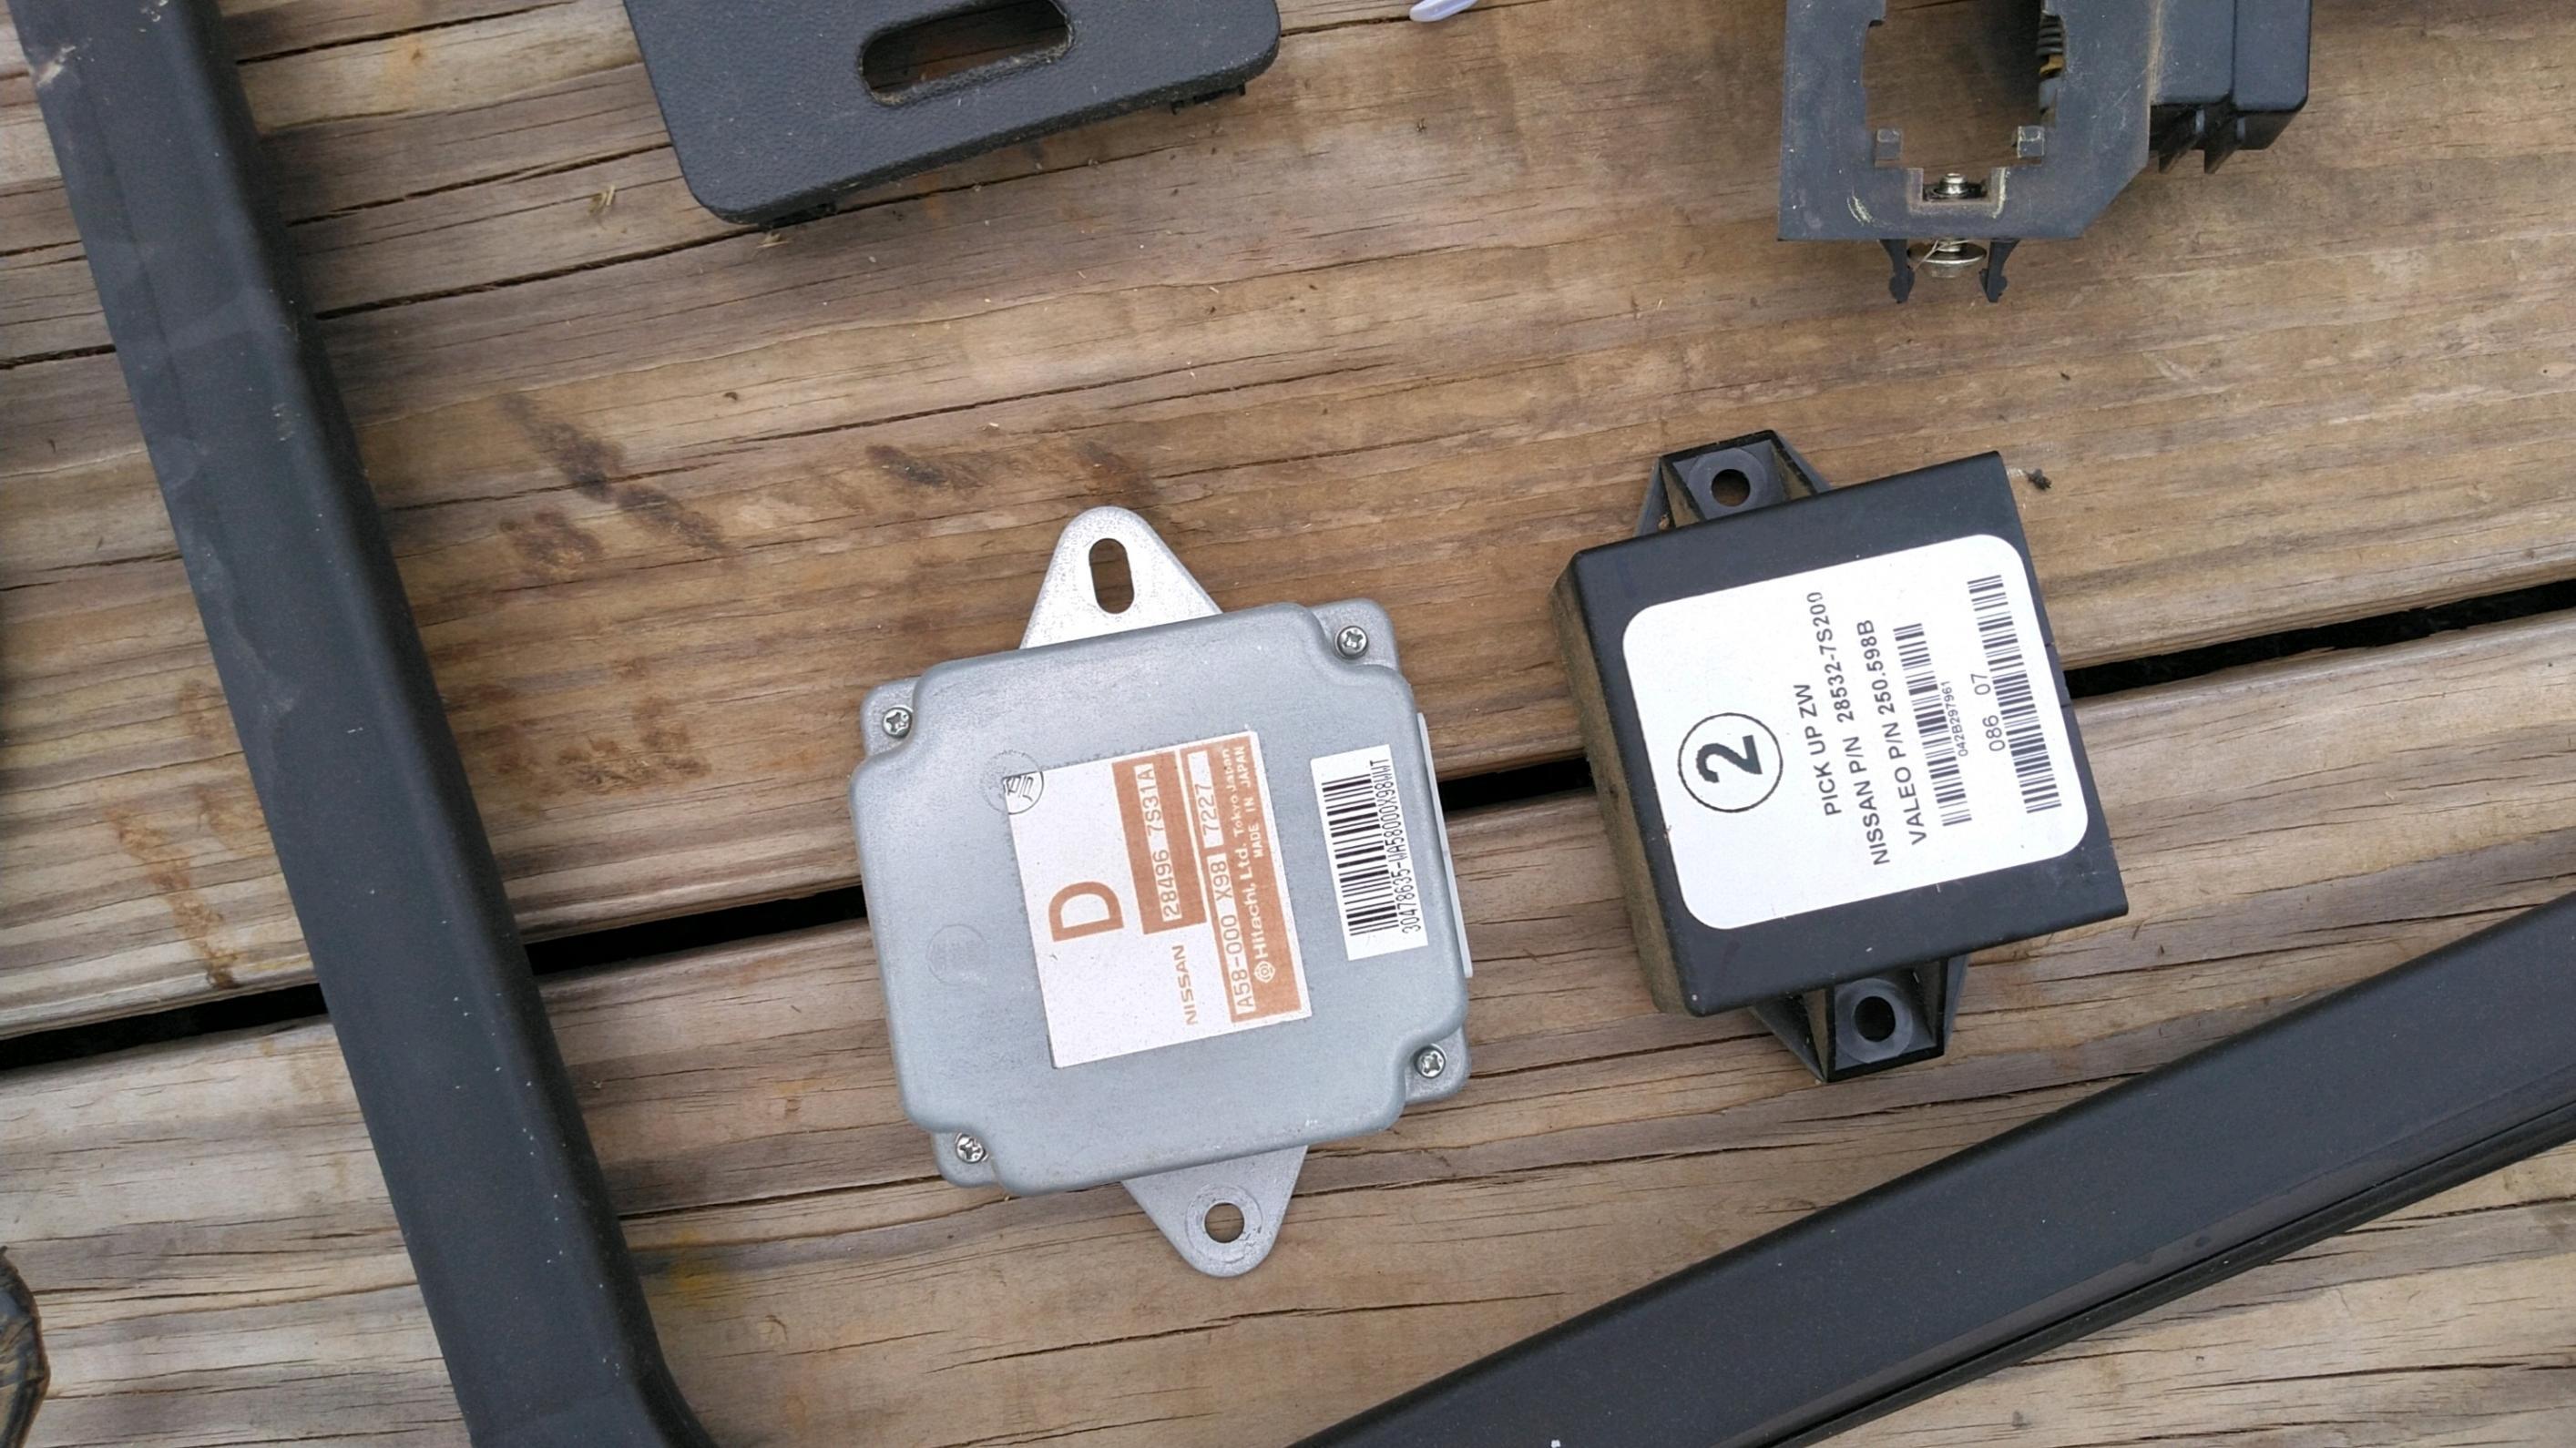 Fs: Titan crew cab parts-output-010-.jpg